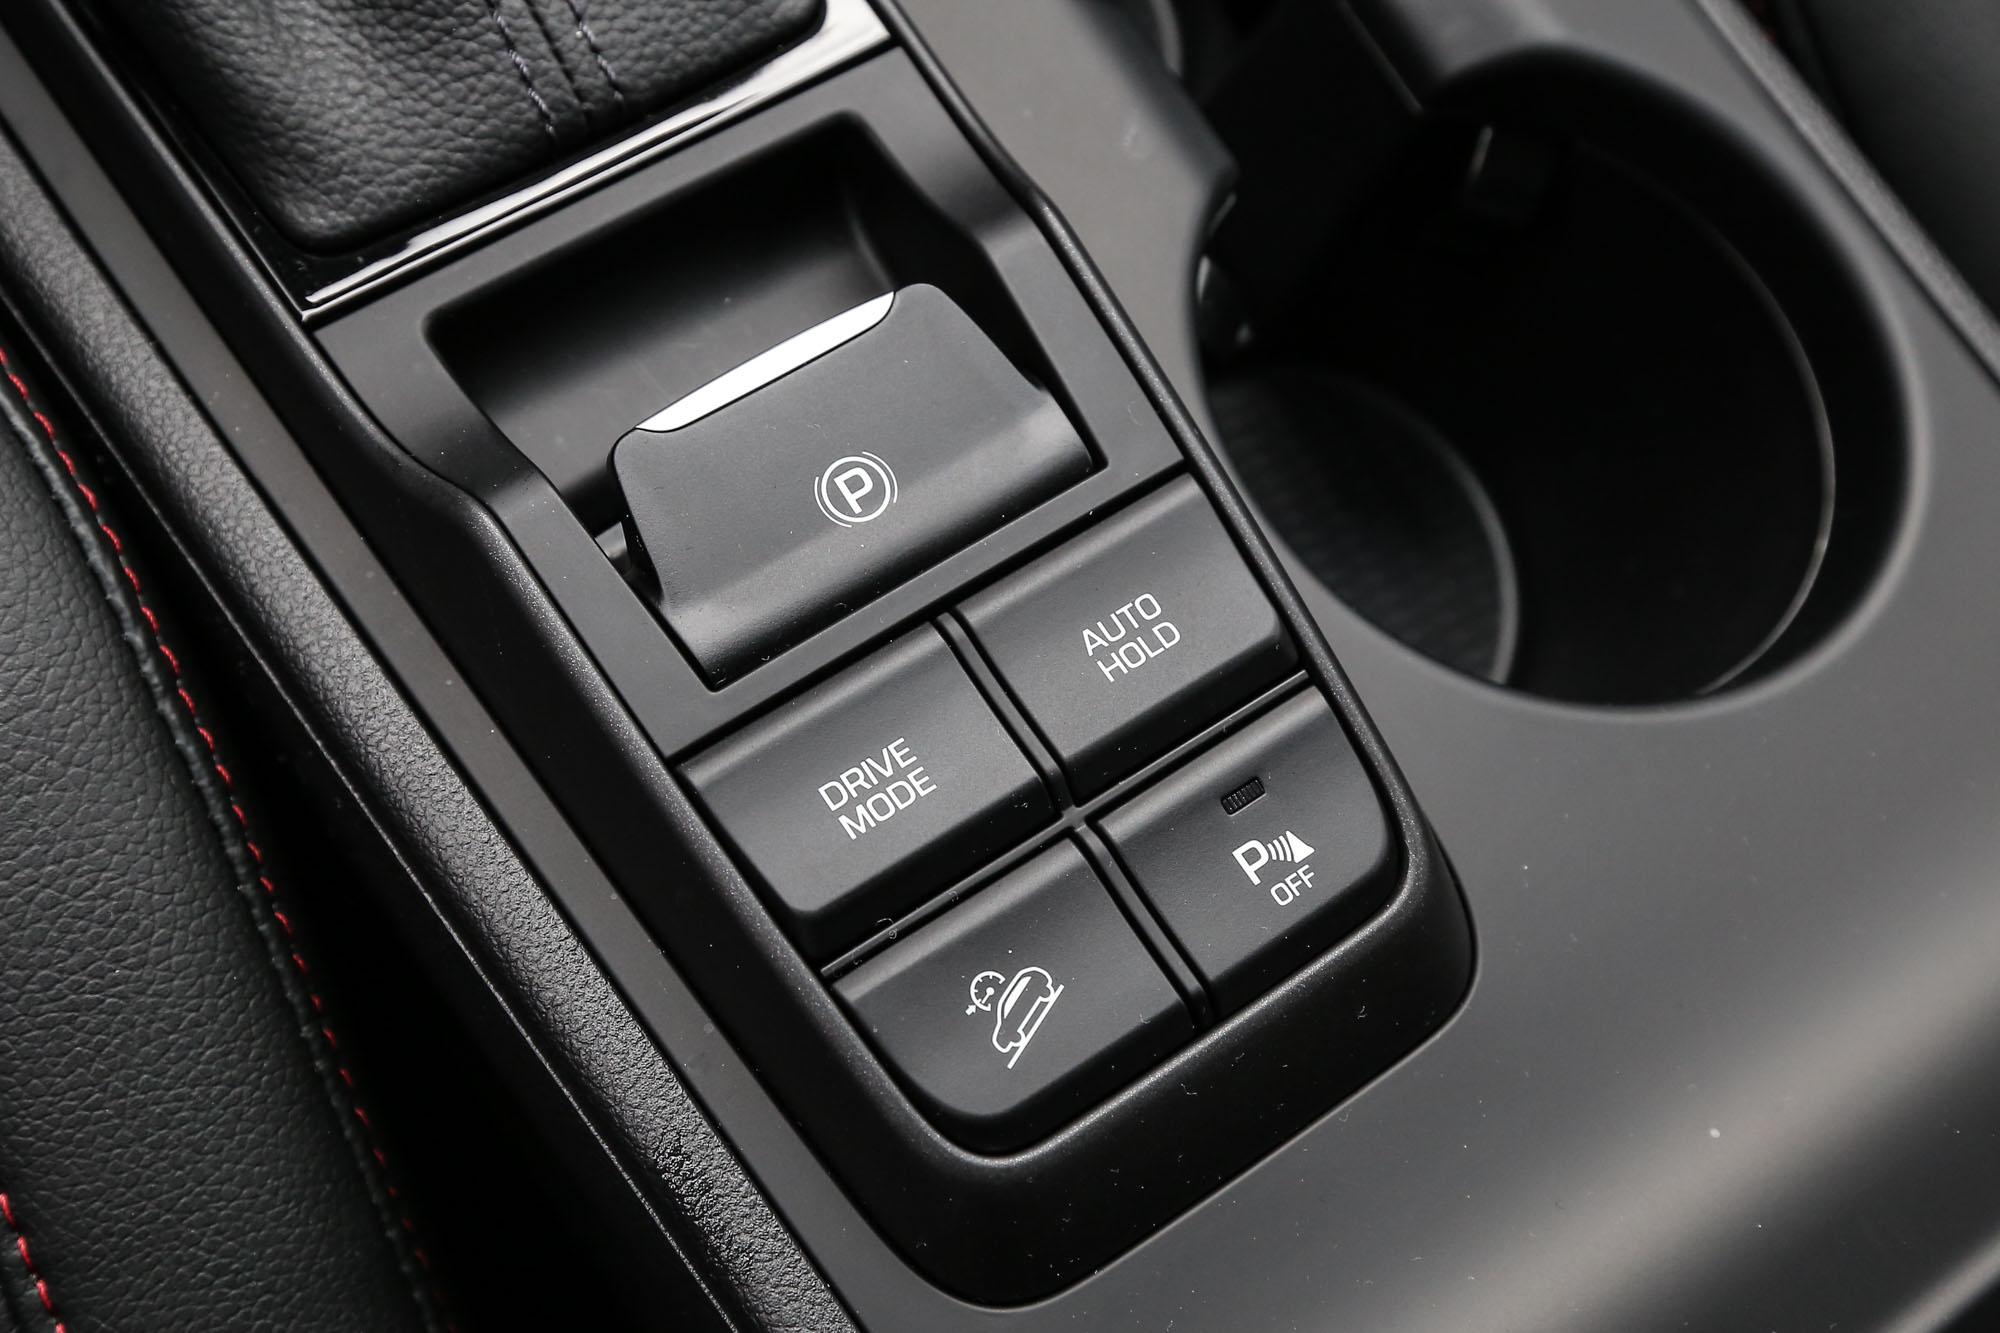 提供 COMFORT、ECO、SPORT 三種模式的 DRIVE MODE 駕駛模式。